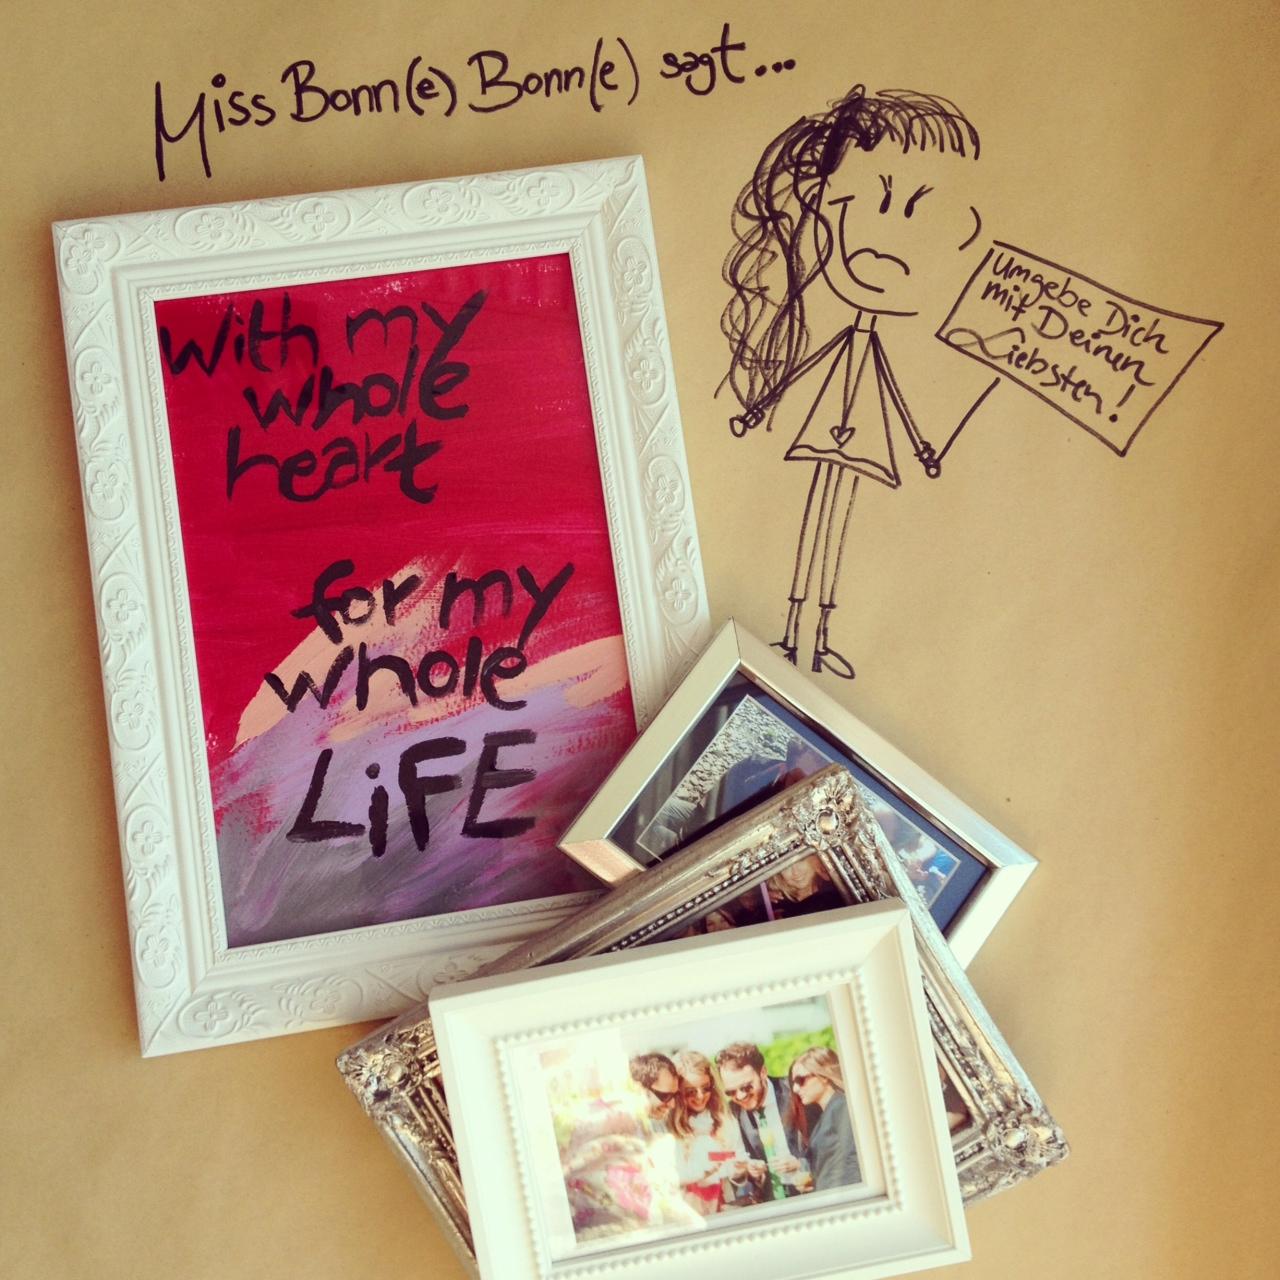 Februar 2013 lifestyle blog aus bonn - Butlers bonn ...